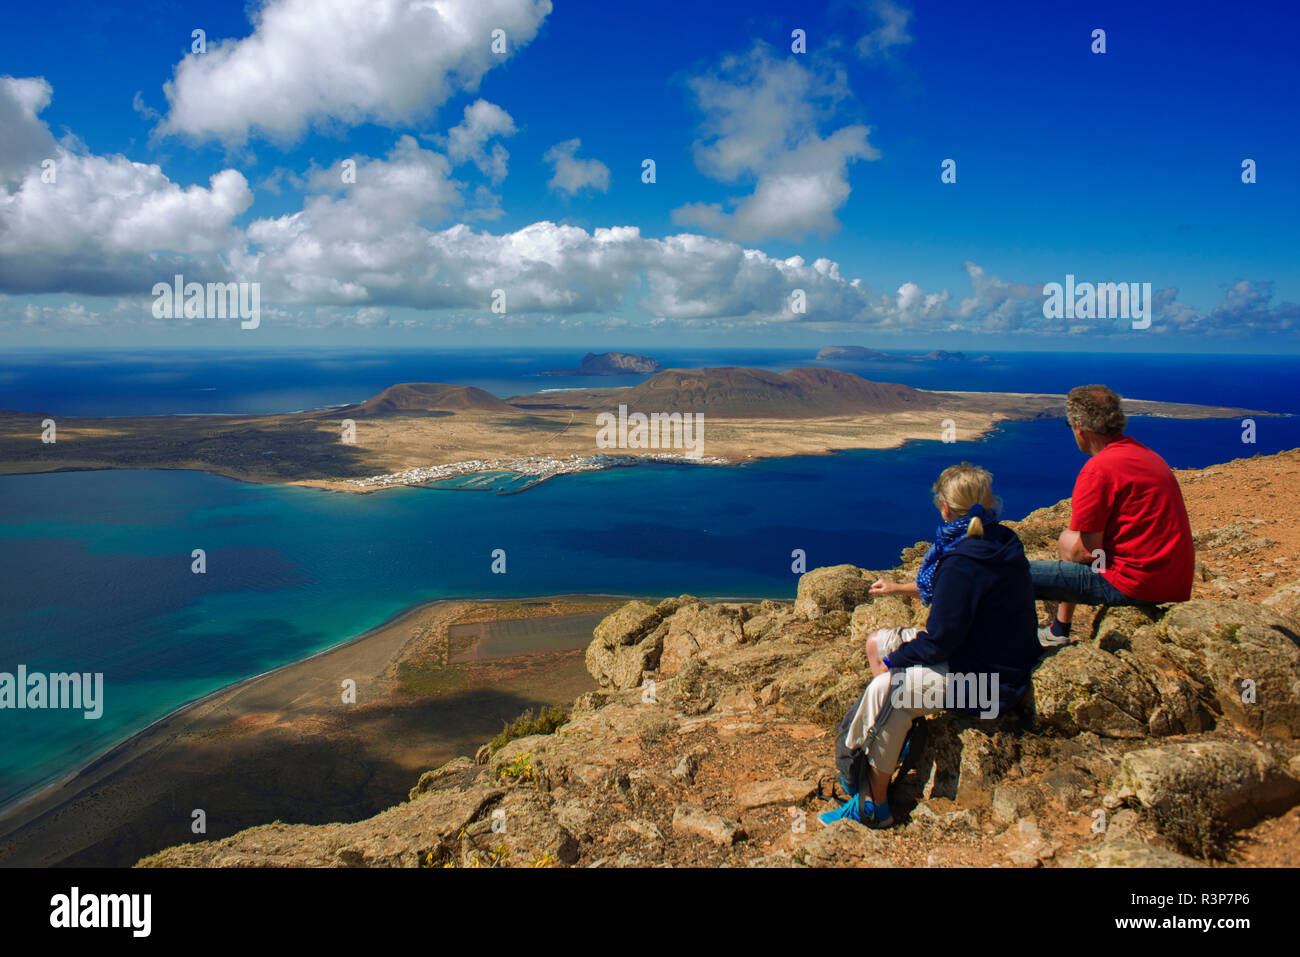 Chinijo Archipel aus der Sicht von El Río: La Graciosa, Montaña Clara und Alegranza, Insel Lanzarote, Kanarische Inseln. Stockbild